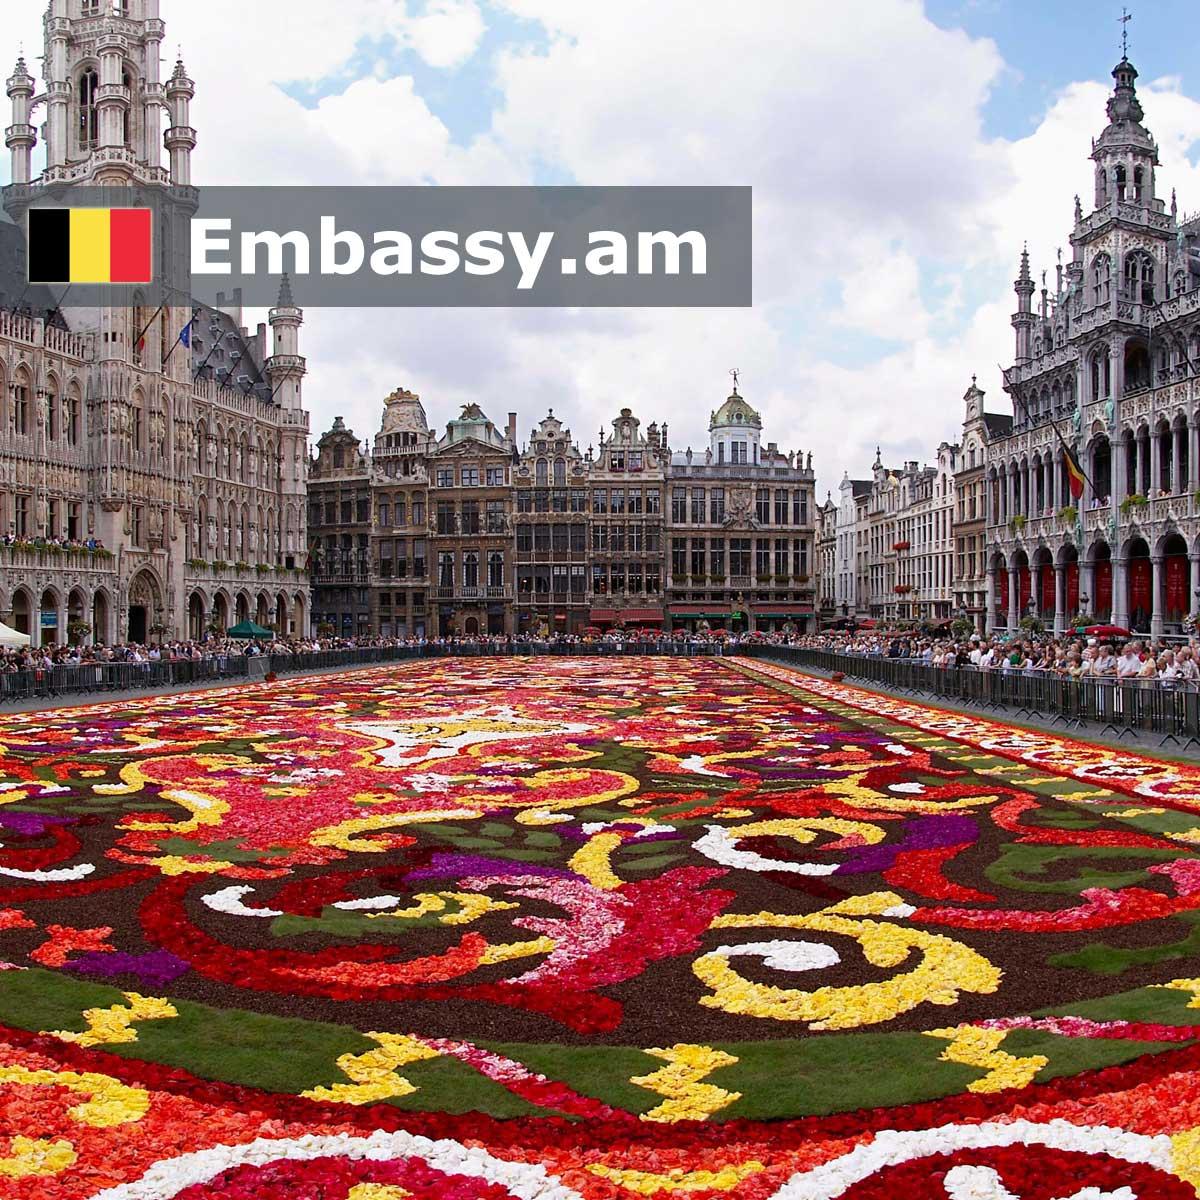 Hotels in Belgium - Embassy.am